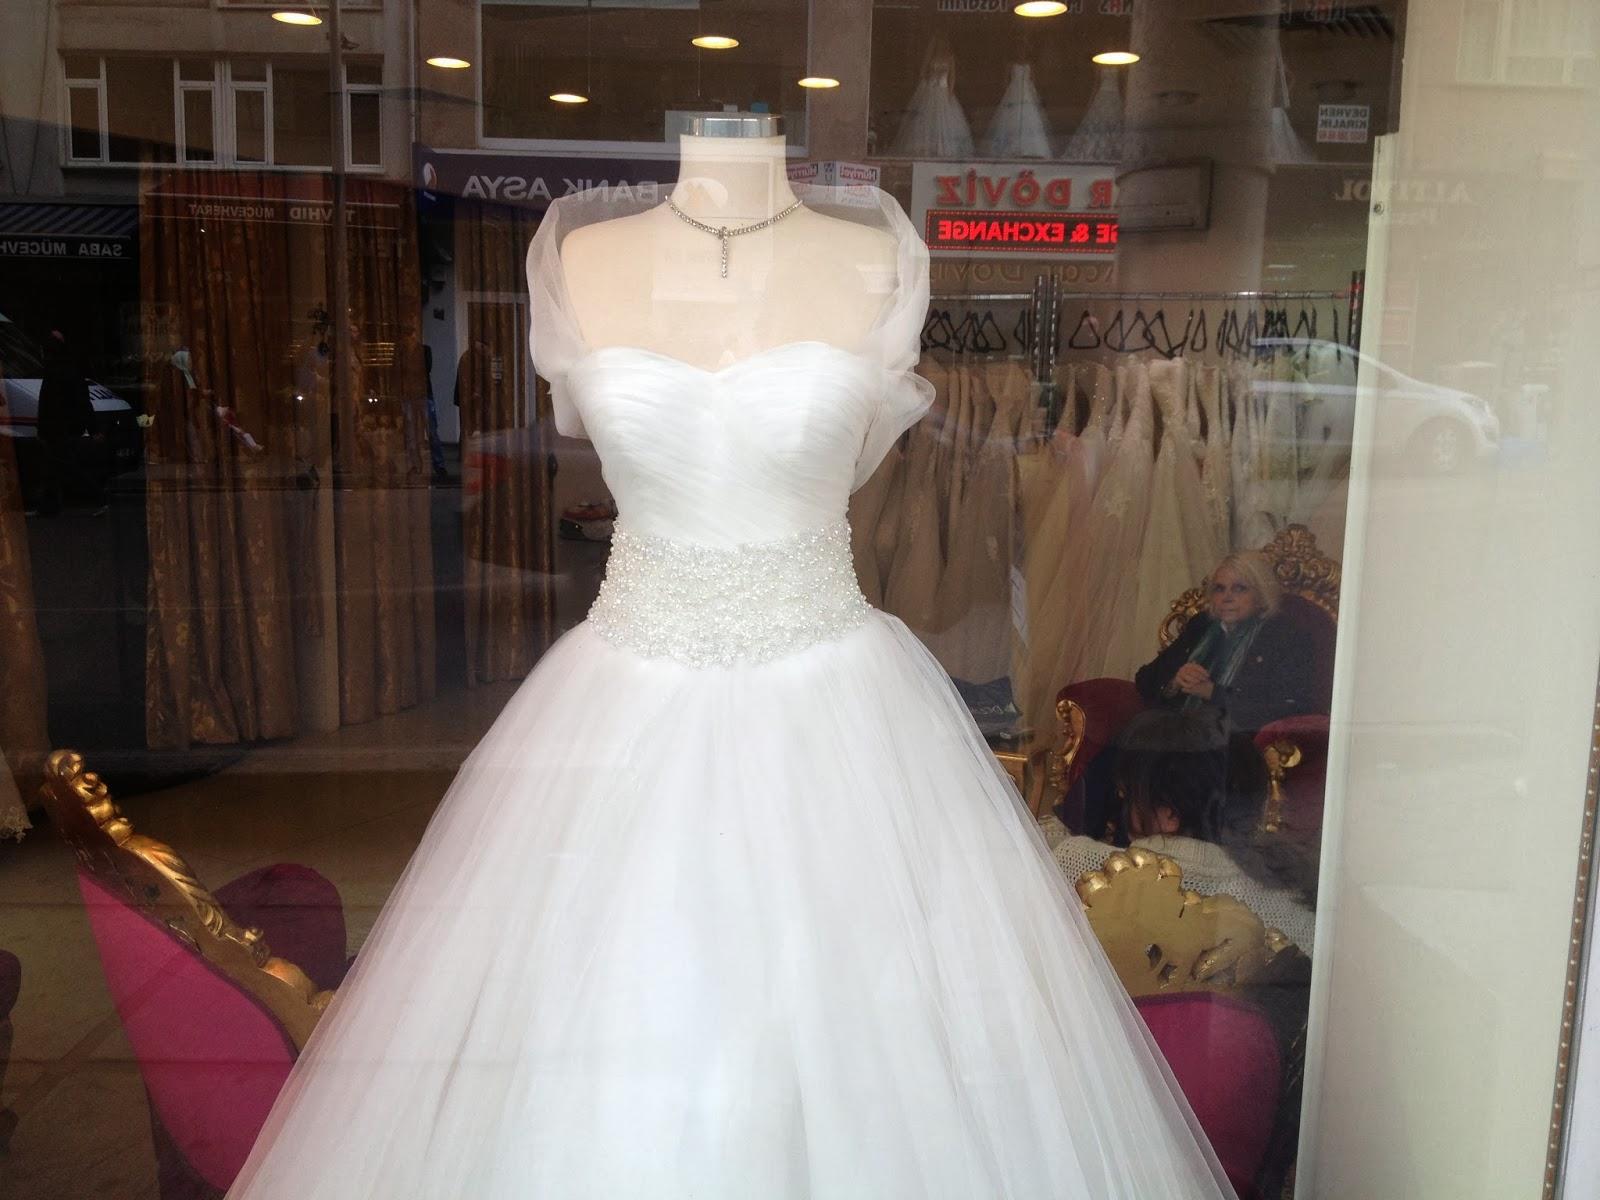 0329a9cce9c4f Acheter sa robe de mariée à Istanbul, oui mais où?